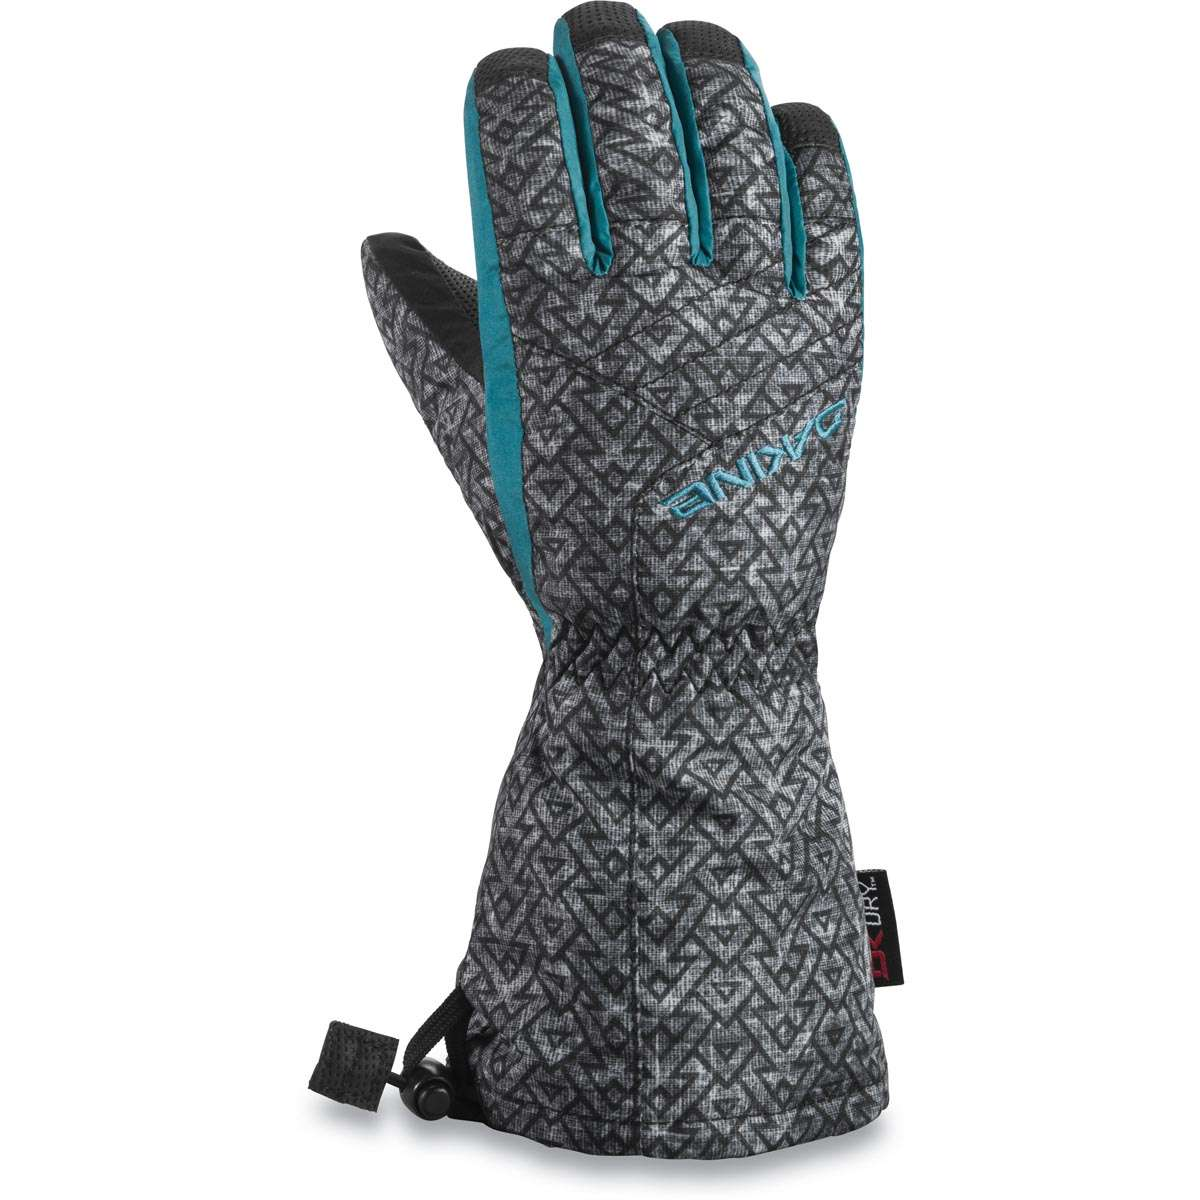 ddcb683b0179a Handschuhe DAKINE Skihandschuhe Snowboard Handschuhe STORM LINER 2019  shadow Herren Bekleidung